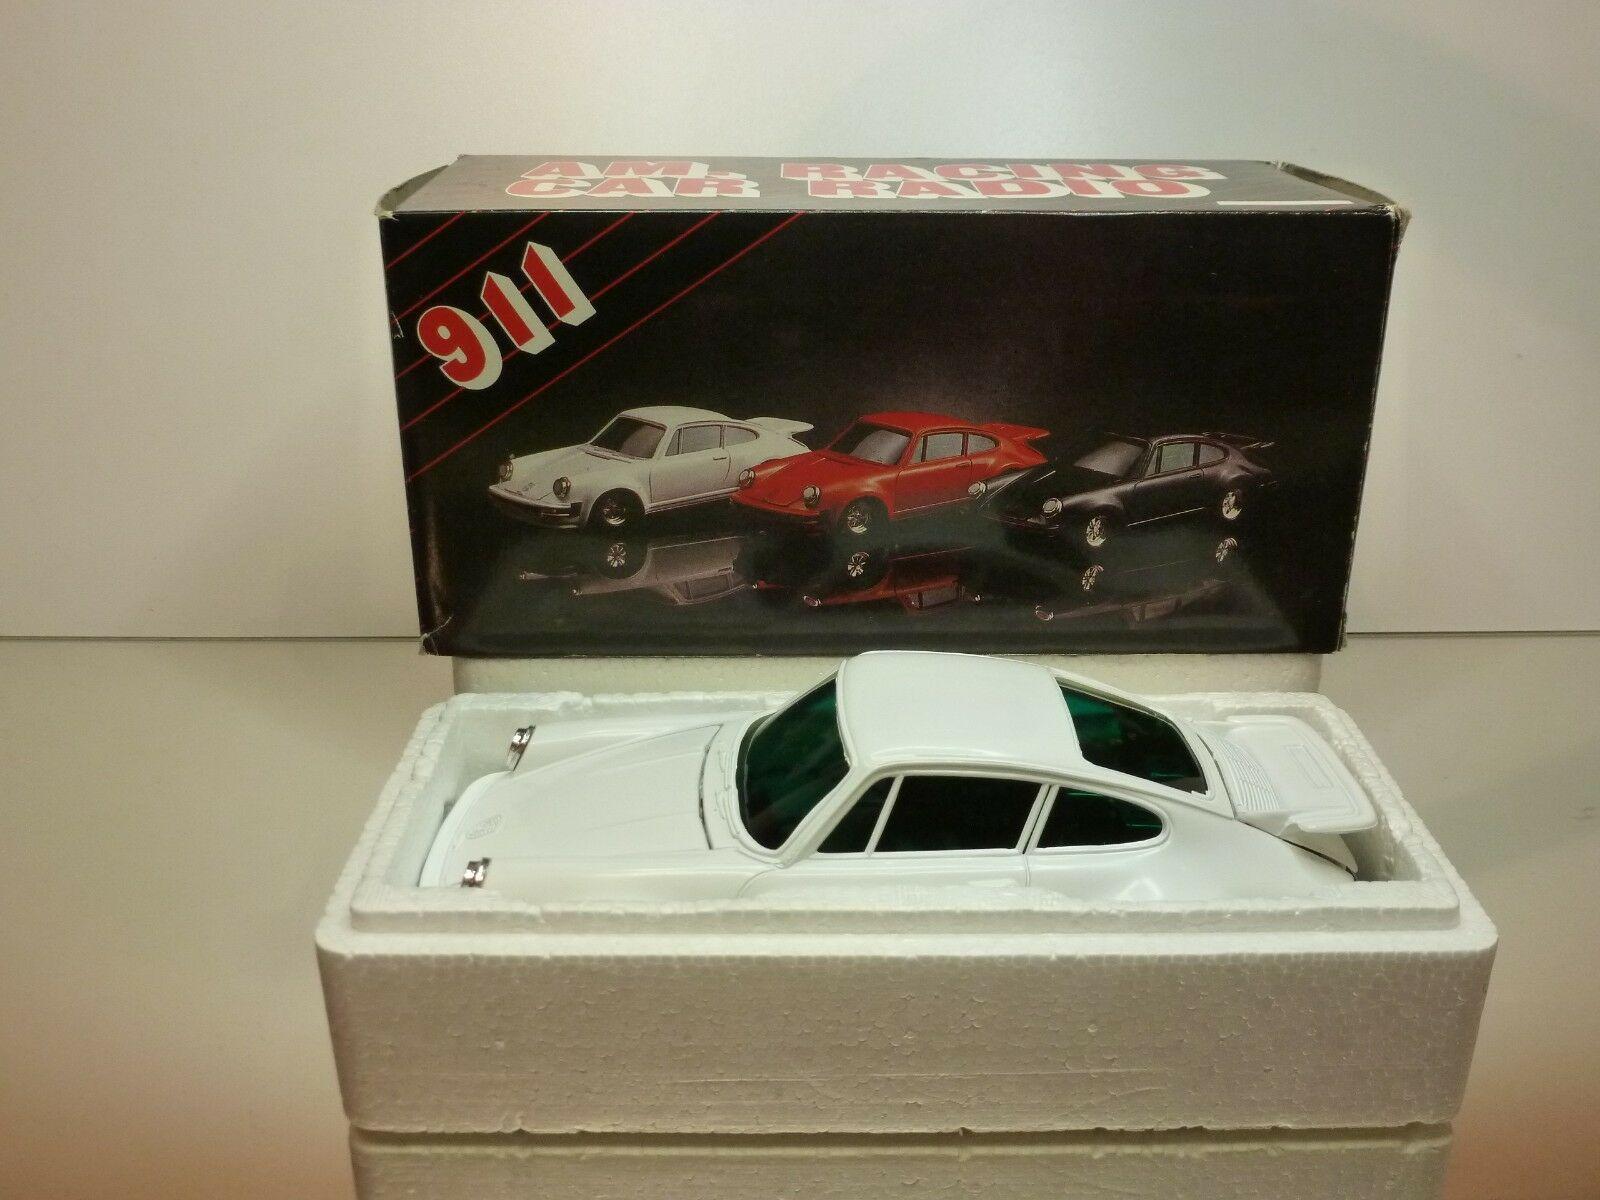 AM-RACING CAR RADIO POSCHE 911 - blanc 1 20- VERY GOOD IN BOX